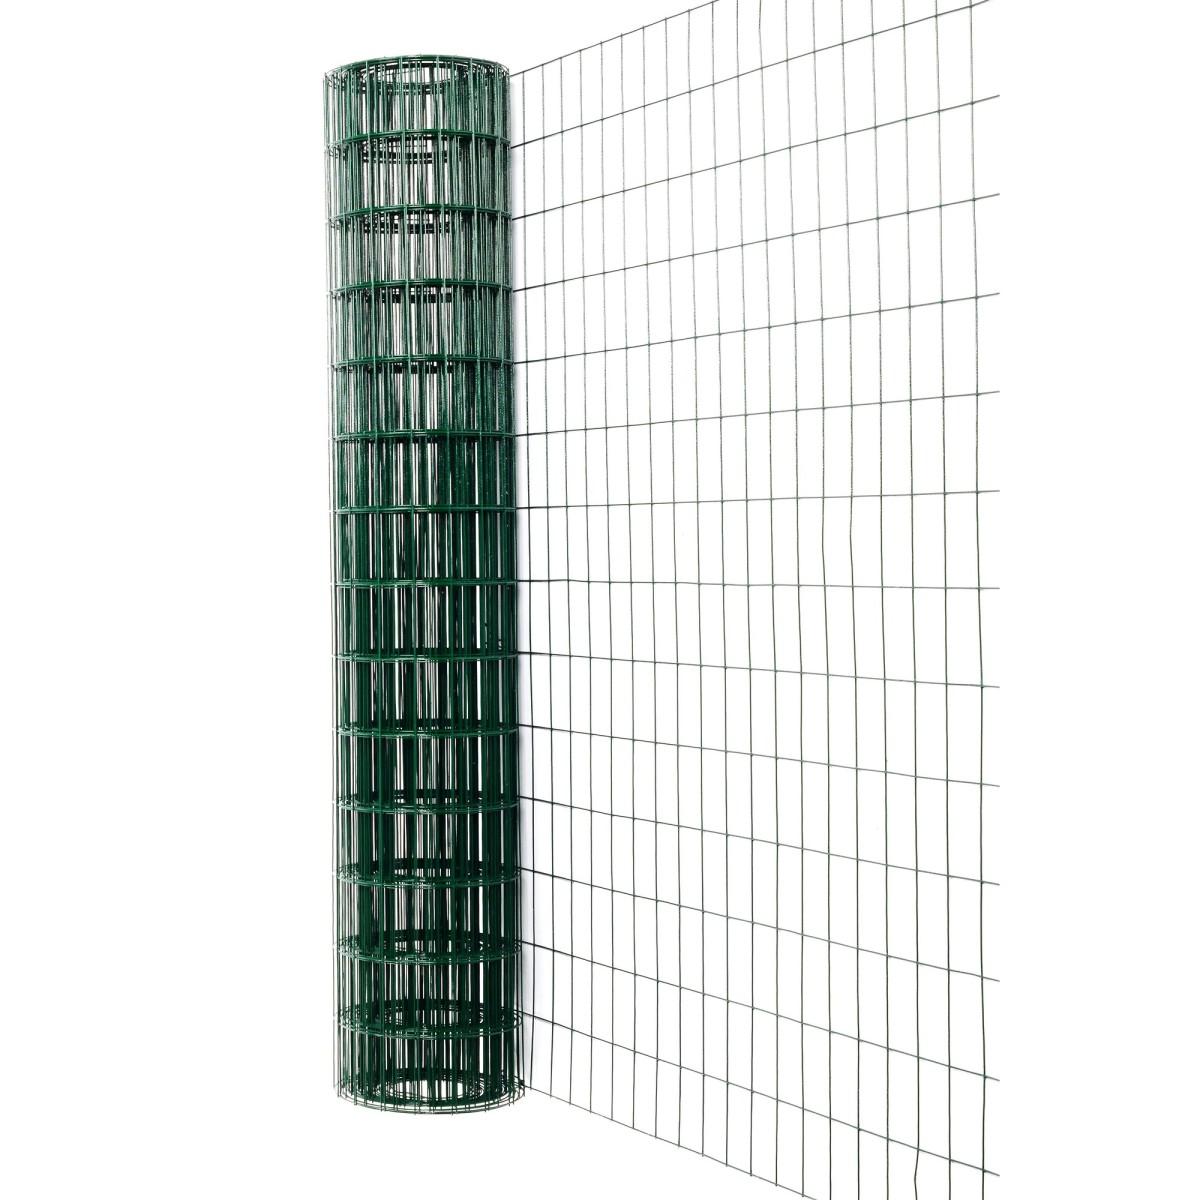 Сетка сварная материал ПВХ размер ячейки 75х100 мм размер сетки 15х1.8 м